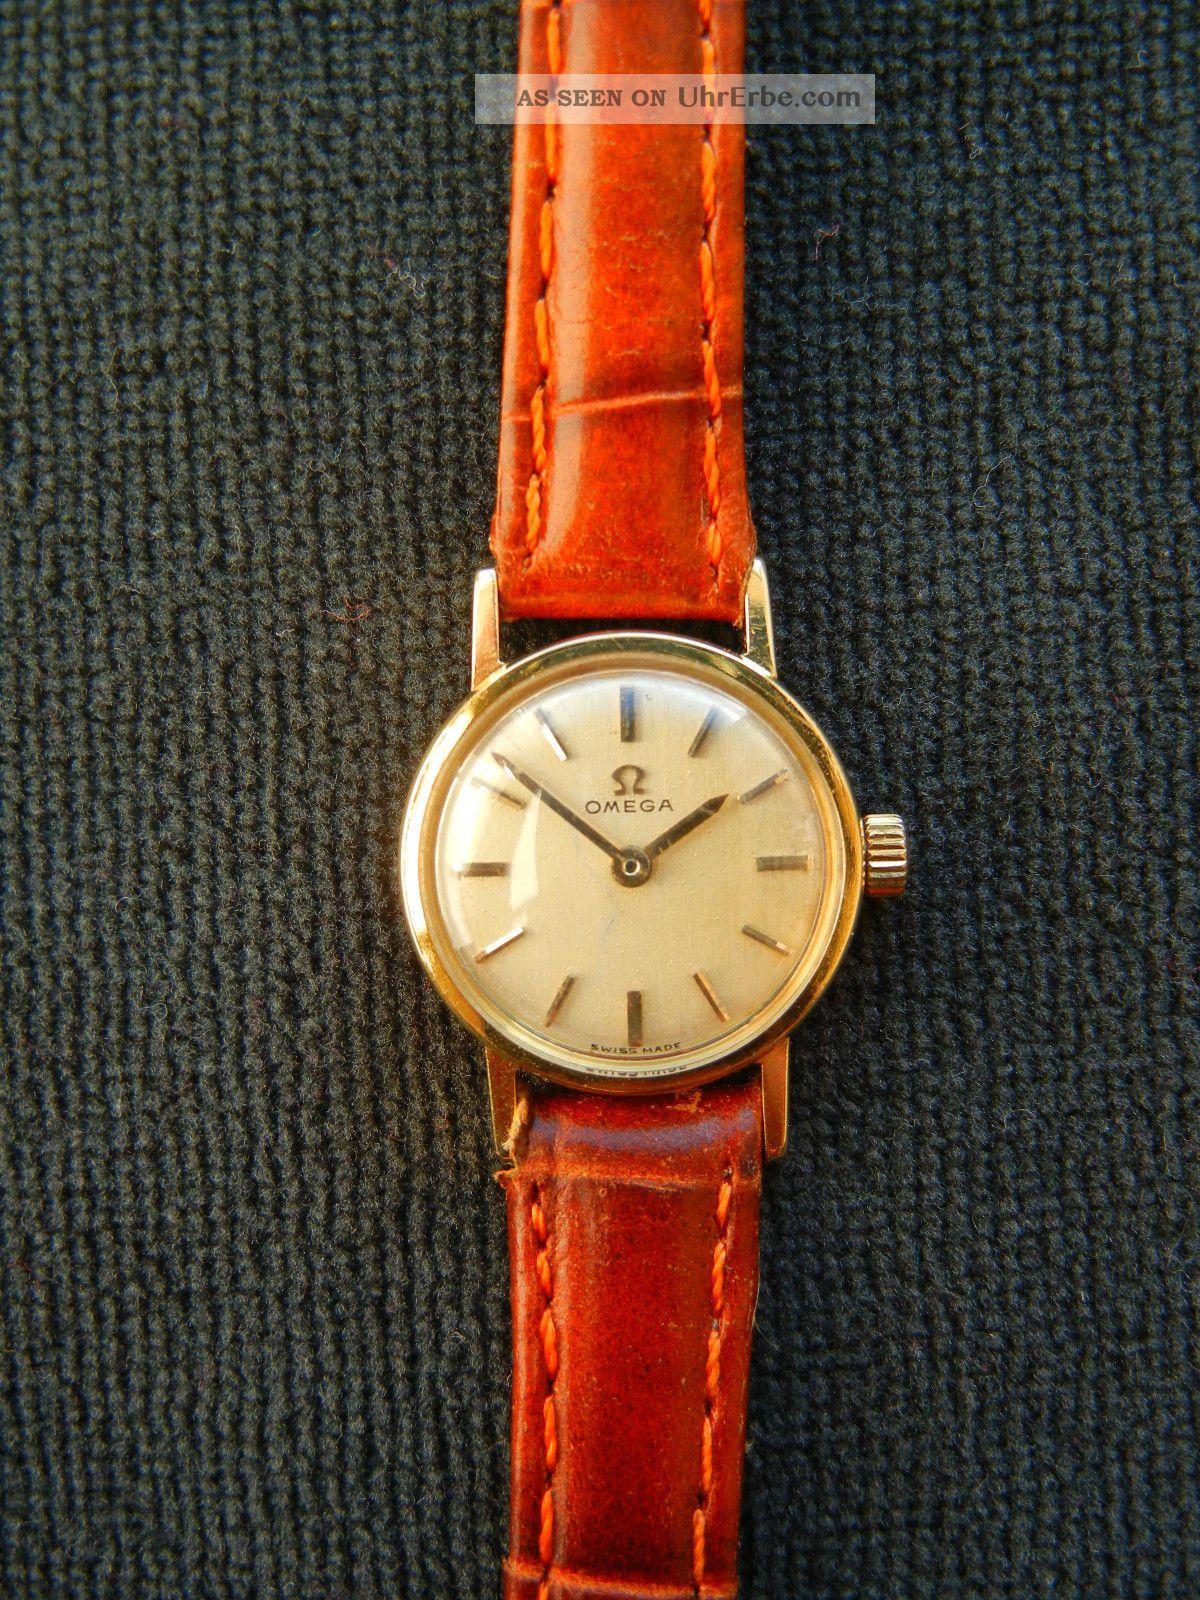 Omega Damenuhr,  18 Karat Gold,  Handaufzug,  Funktioniert Armbanduhren Bild